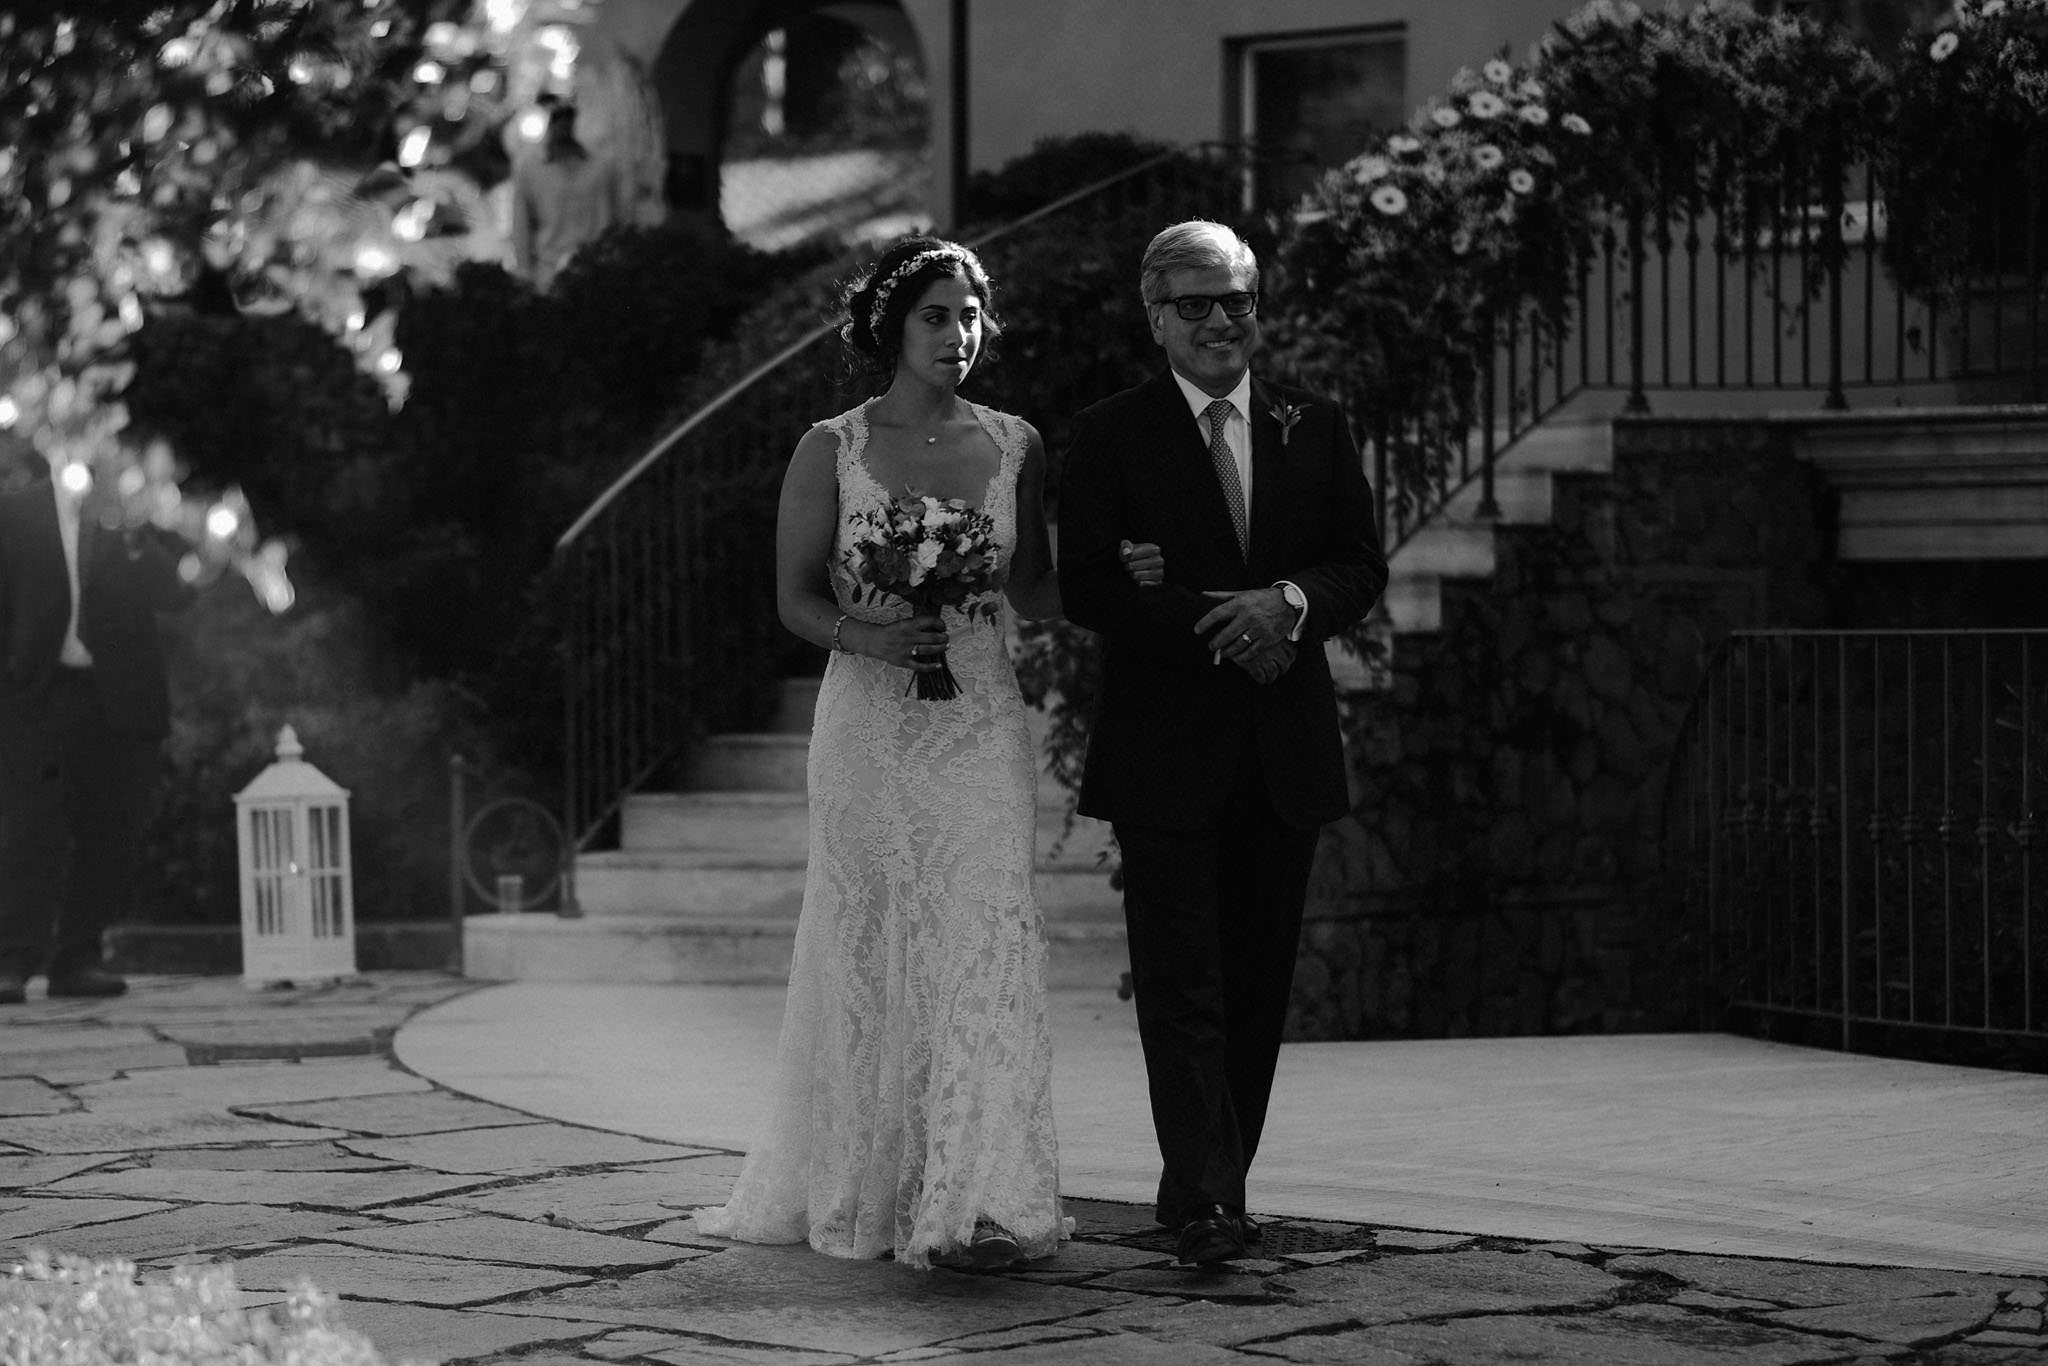 Max-Steph-Italy-Wedding-344.jpg